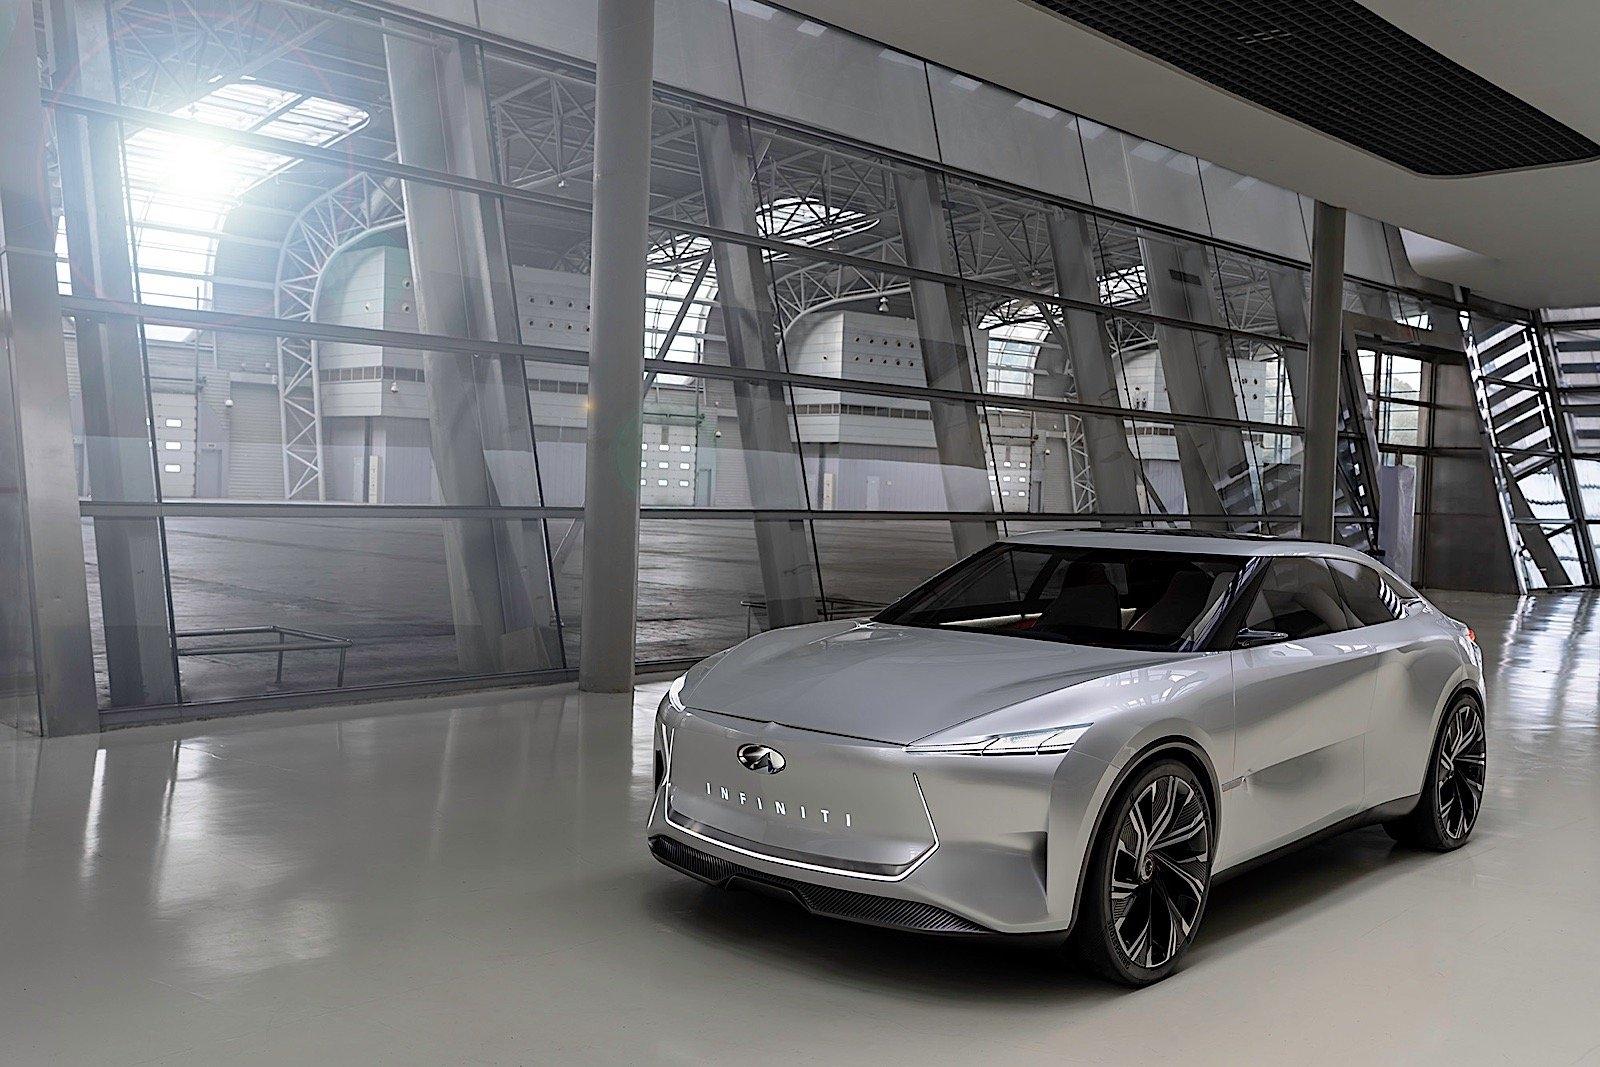 Take a peek at Infiniti's 'Qs Inspiration' EV concept | DeviceDaily.com